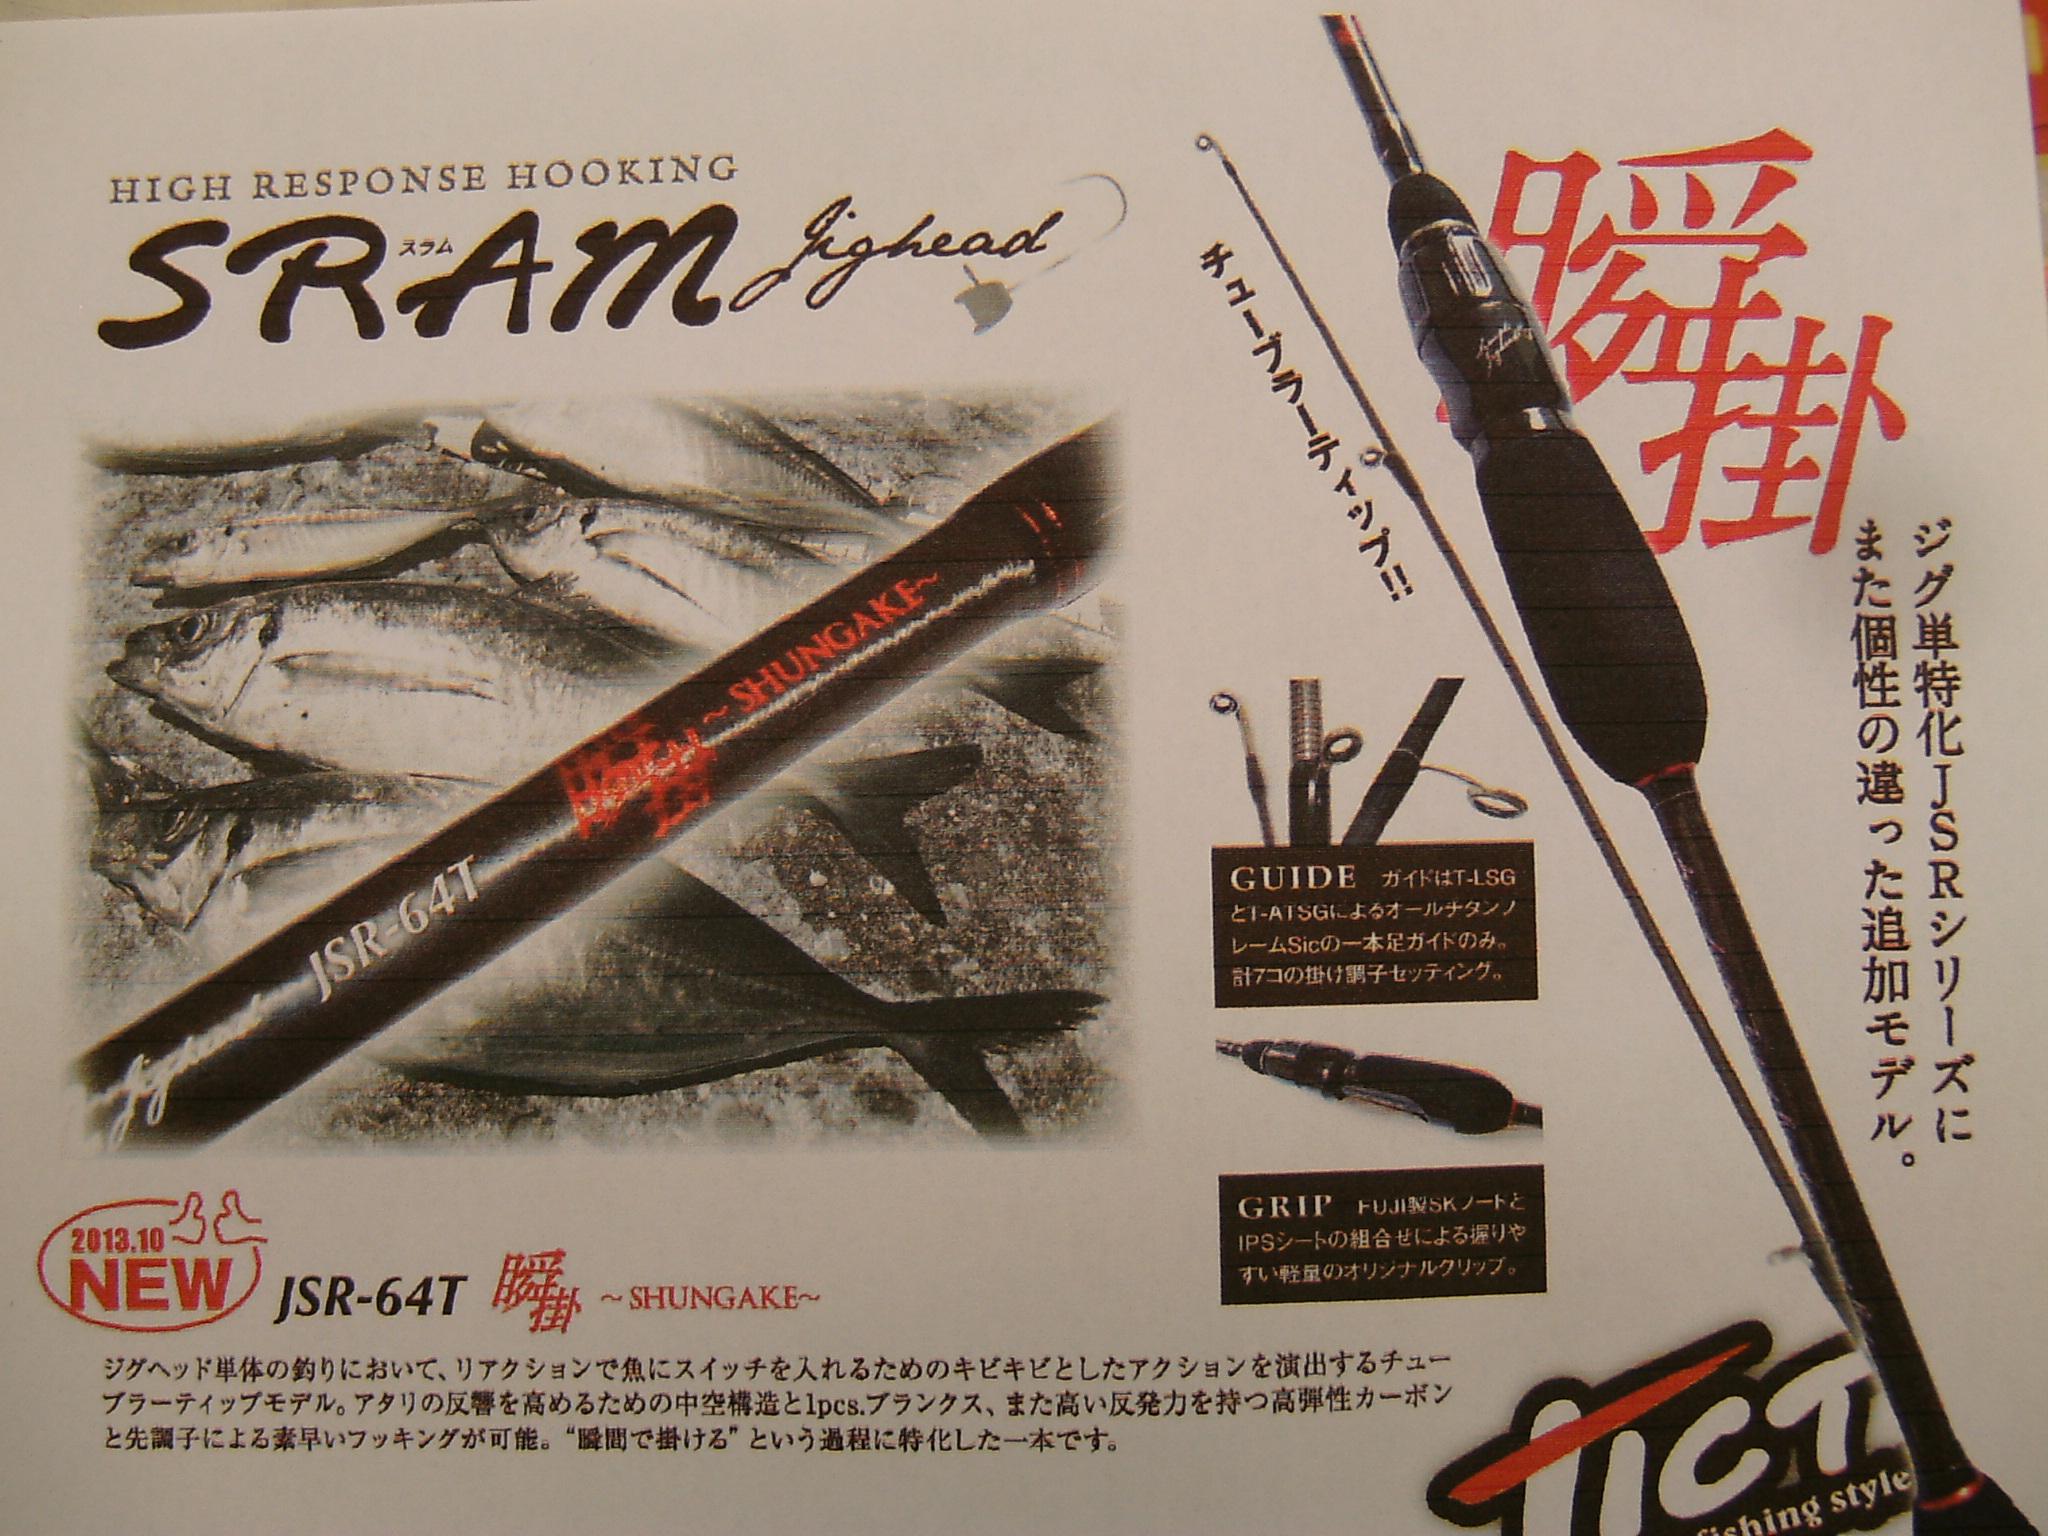 http://www.e-angle.co.jp/shop/news/sram64.jpg